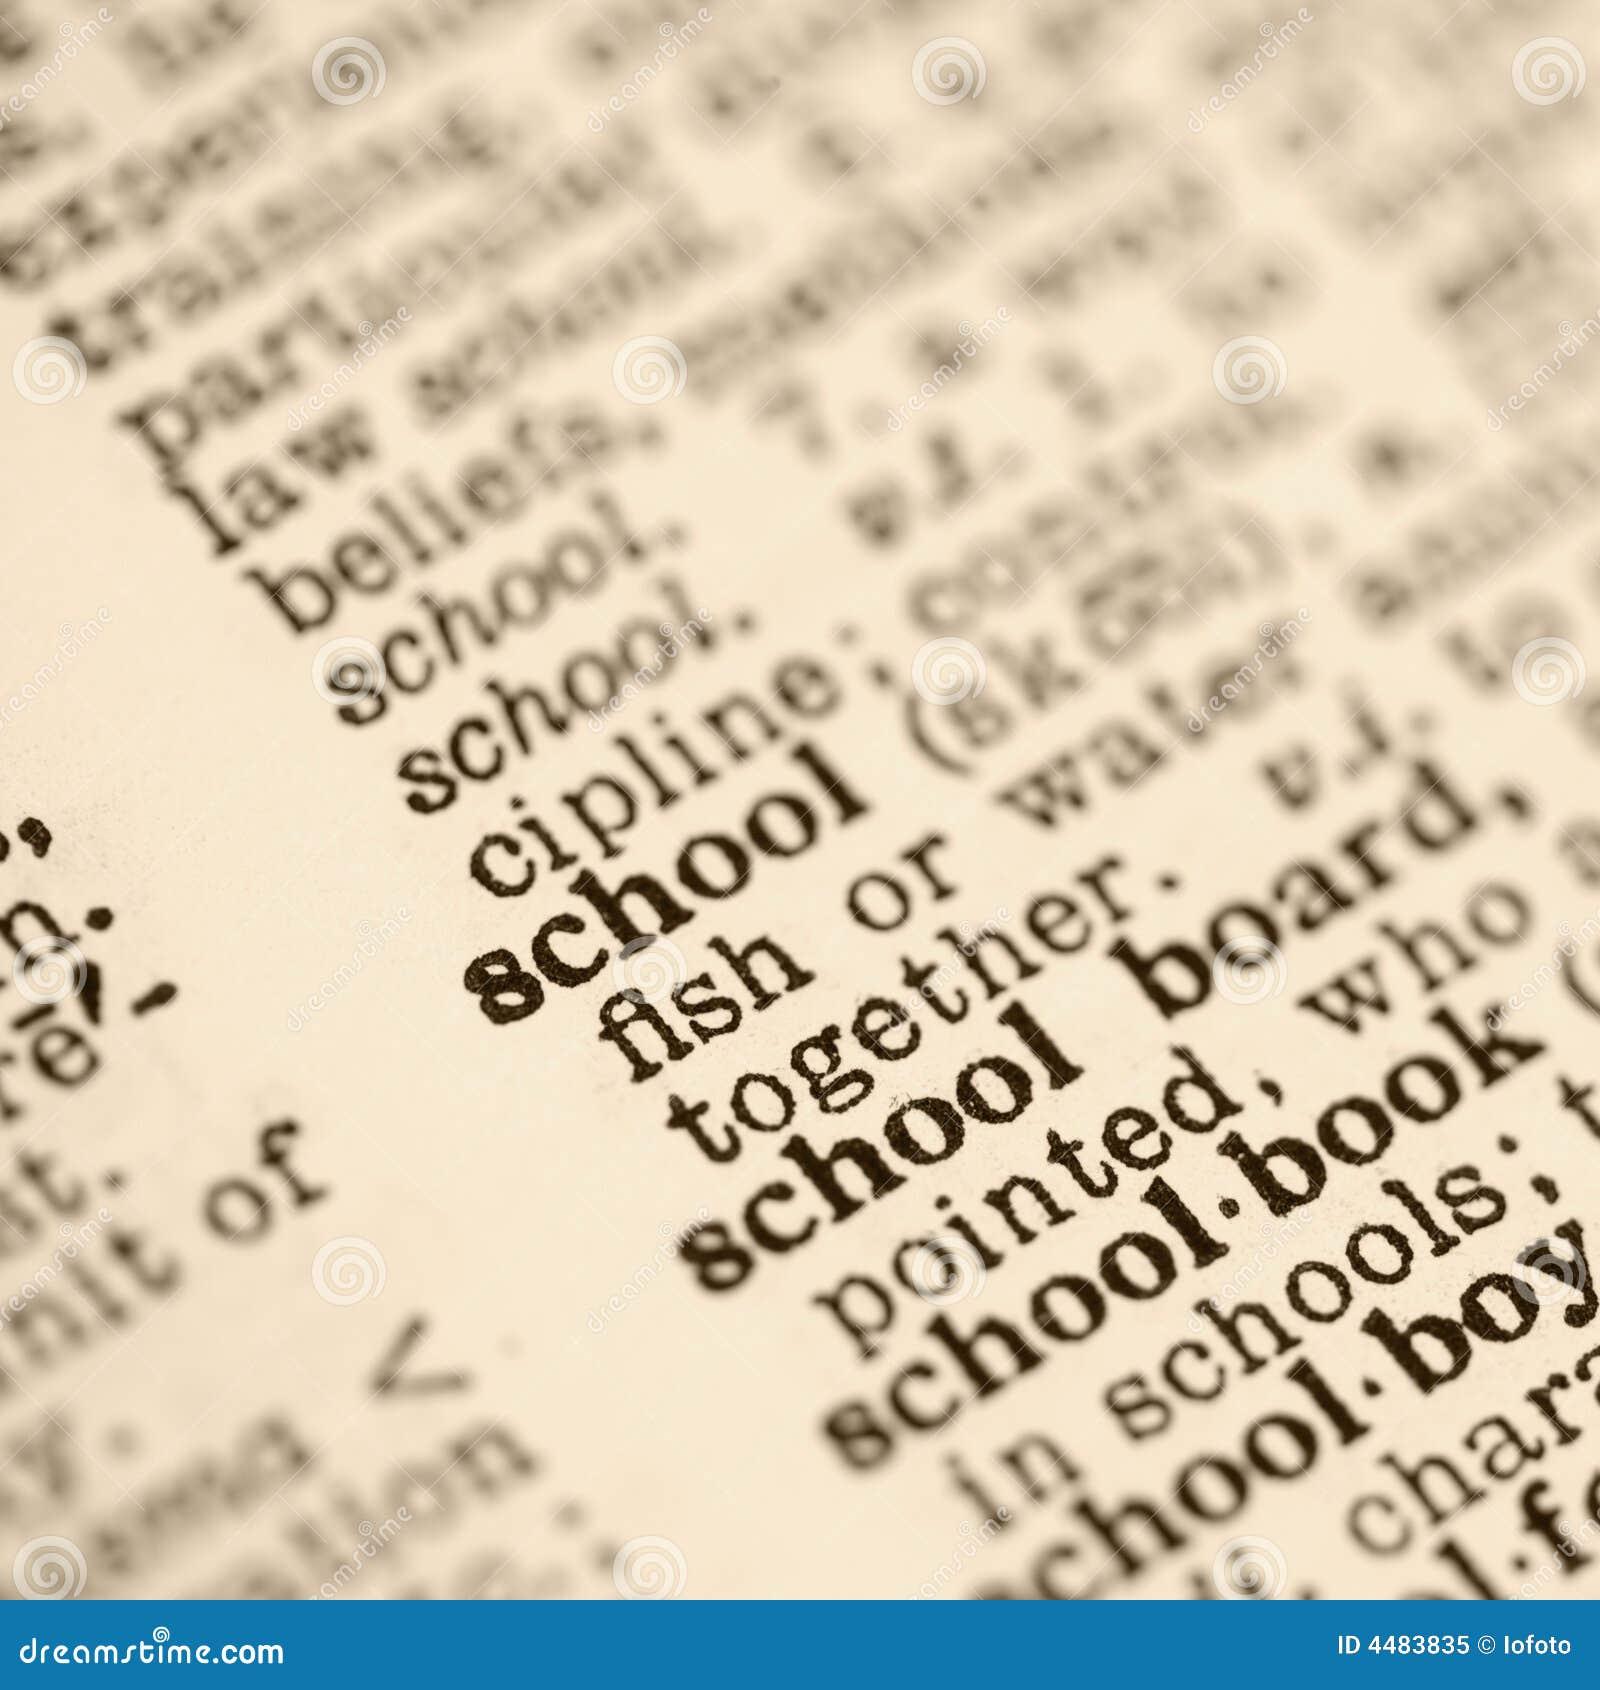 School Life Picture Dictionary#1 worksheet - Free ESL printable ...